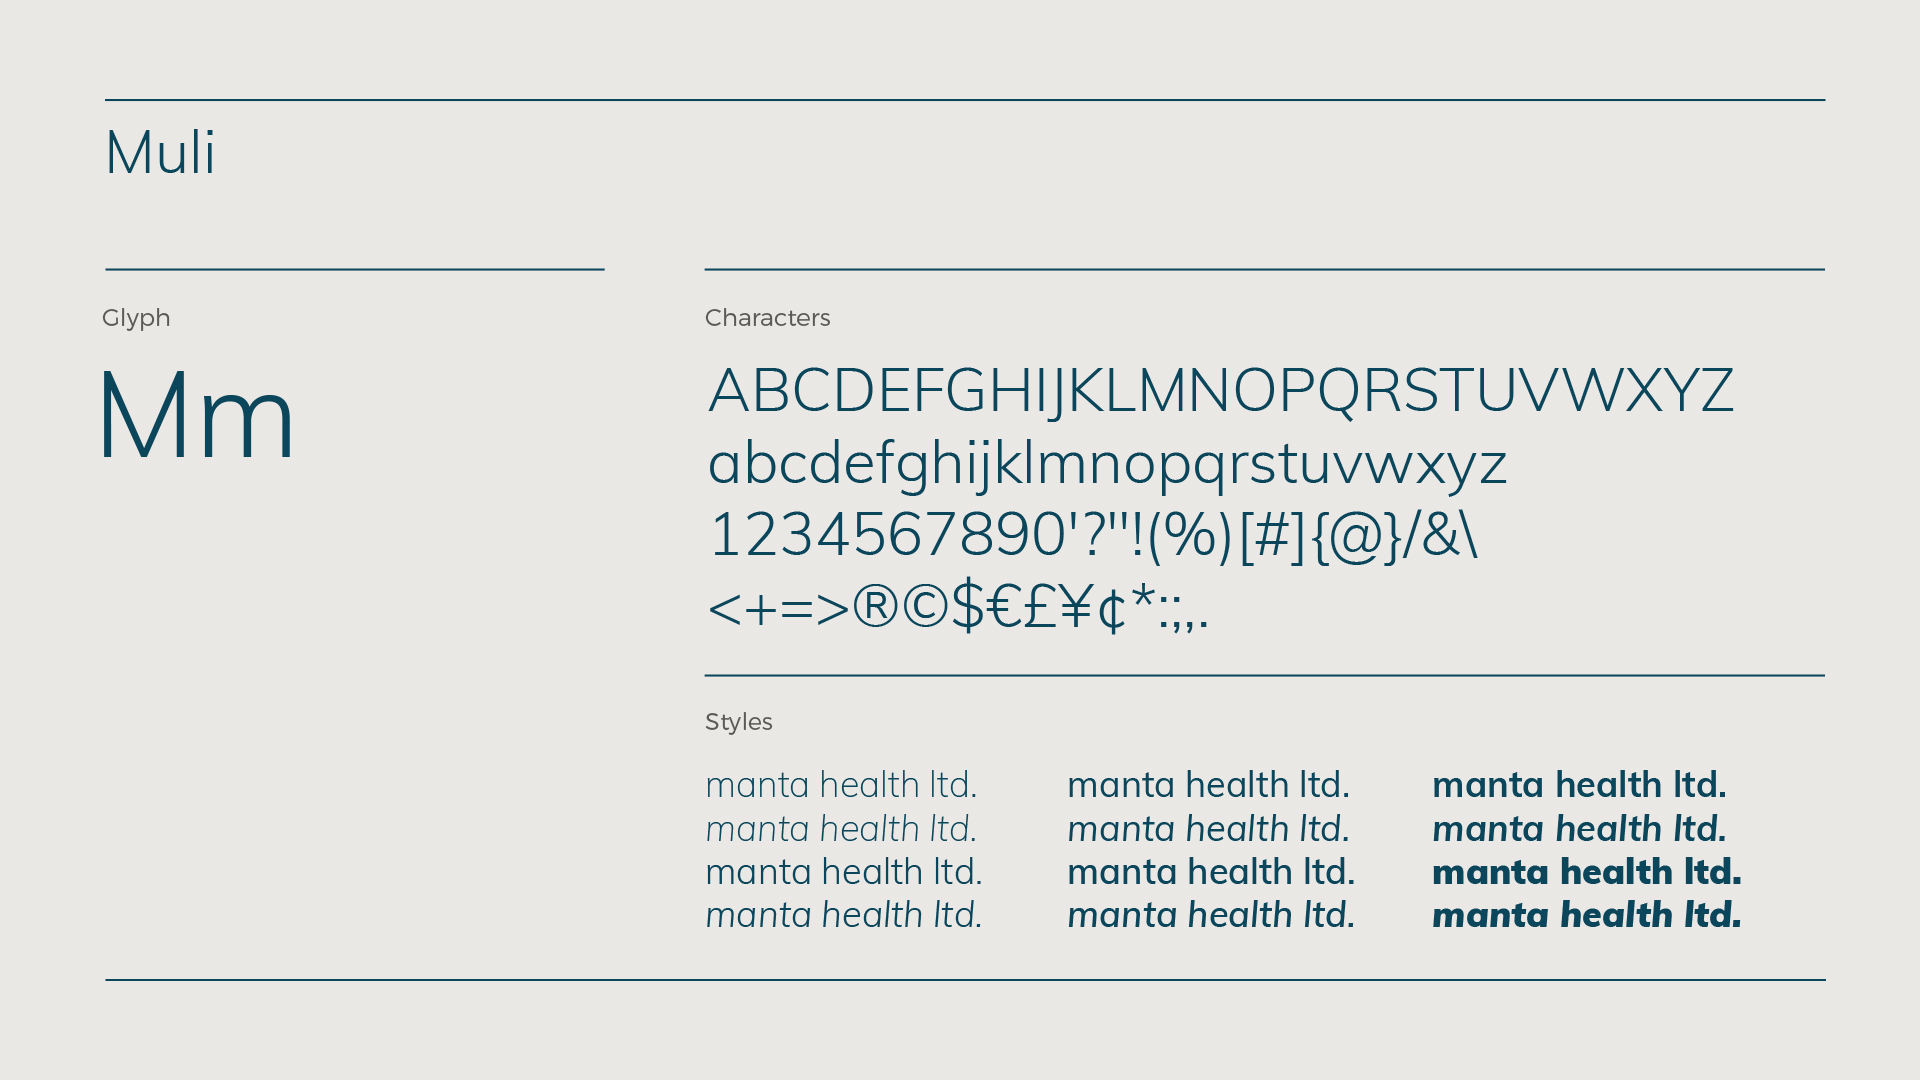 190111-Muli-Font.jpg